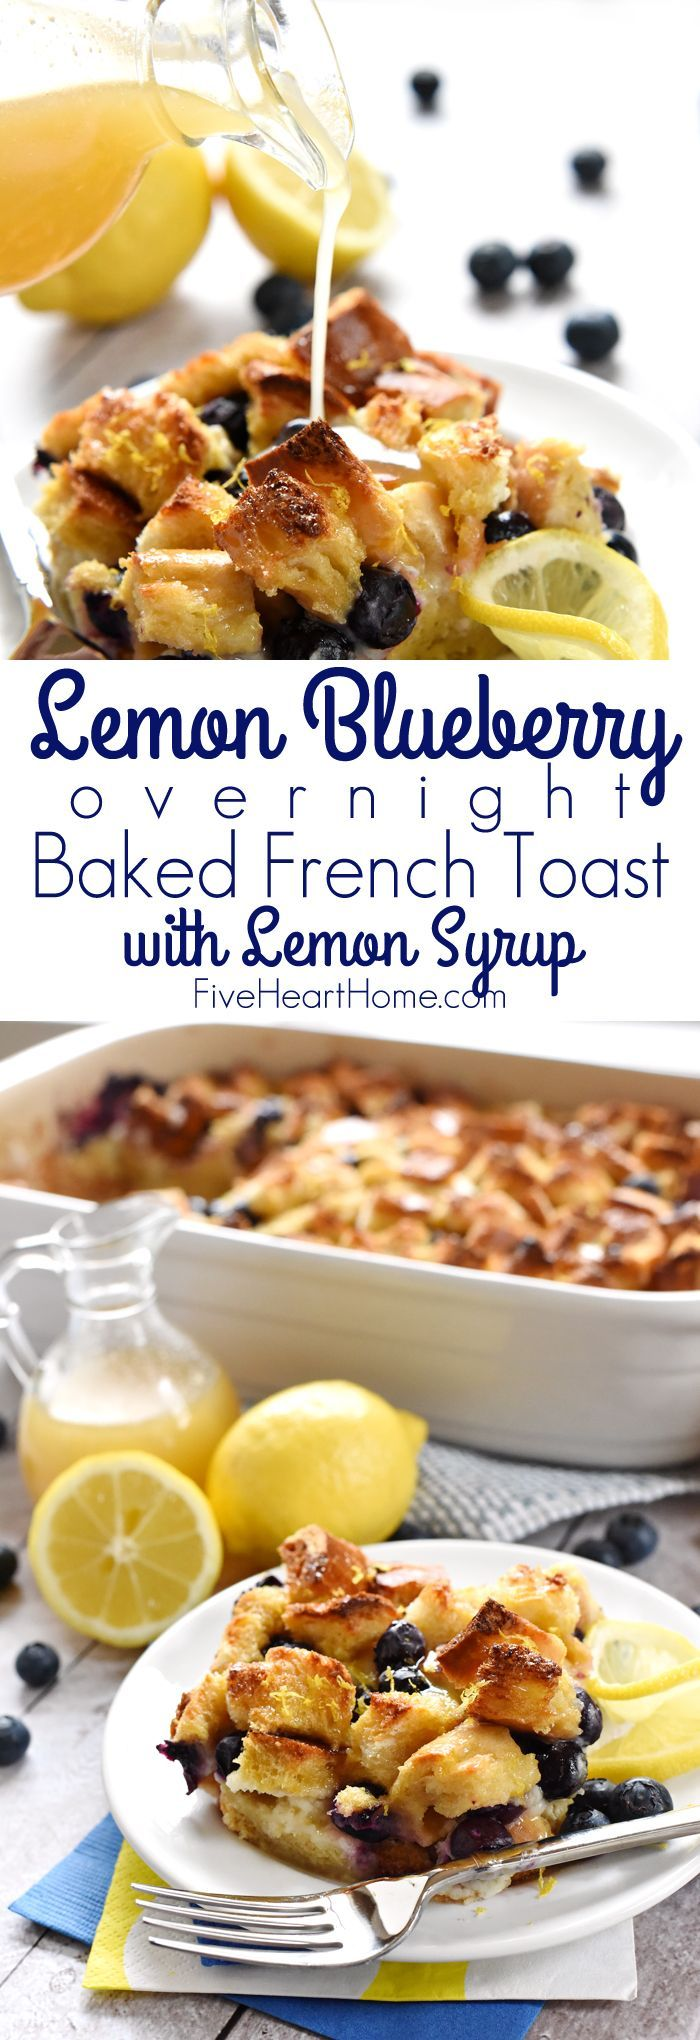 Lemon Blueberry Overnight Baked French Toast with Lemon Syrup #spring #brunch